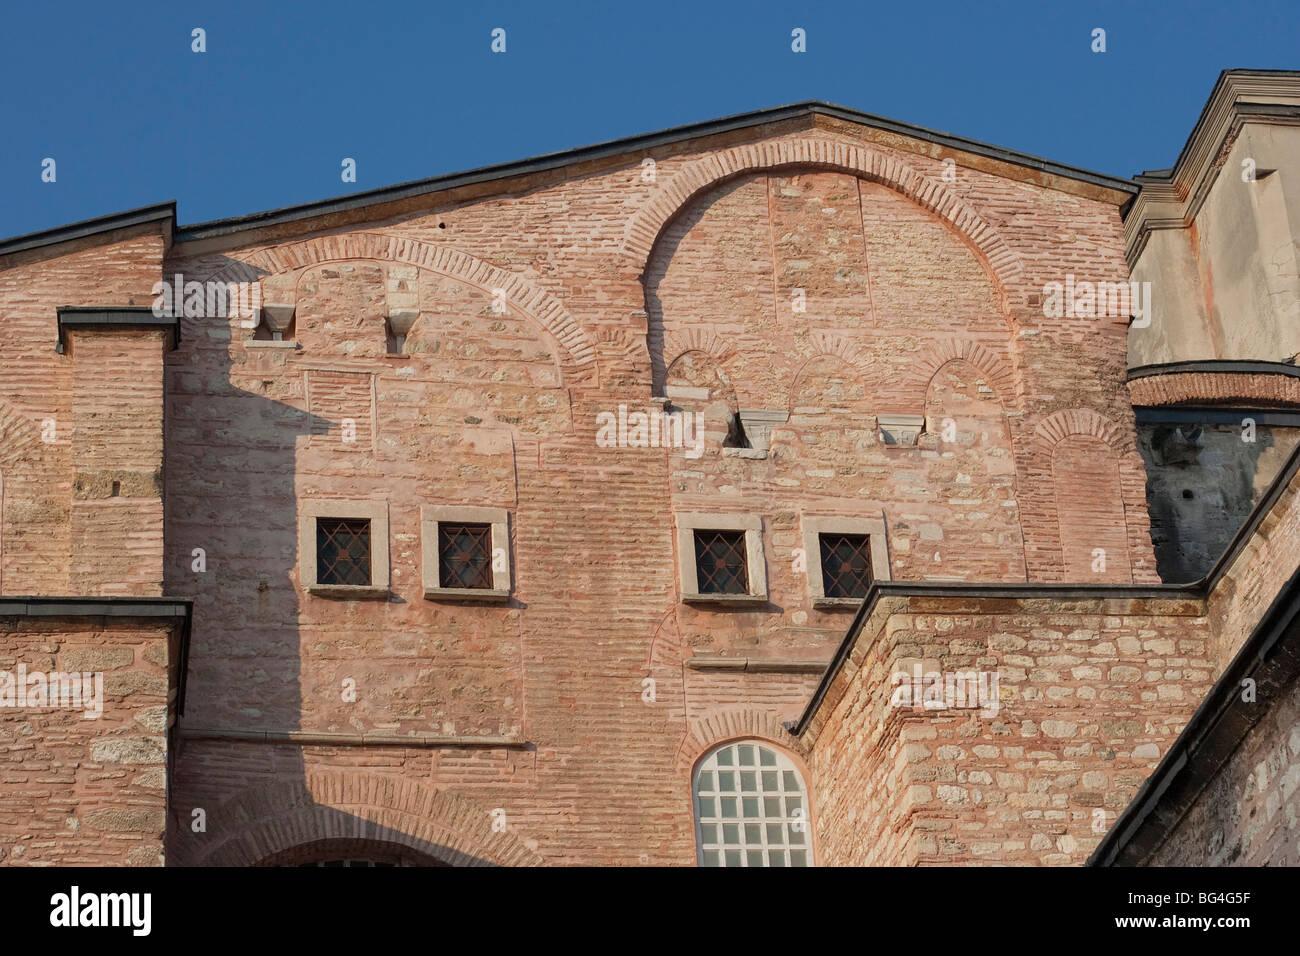 Hagia Sophia in Istanbul - Rear View - Sultanahmet District, Istanbul, Turkey, Europe Stock Photo